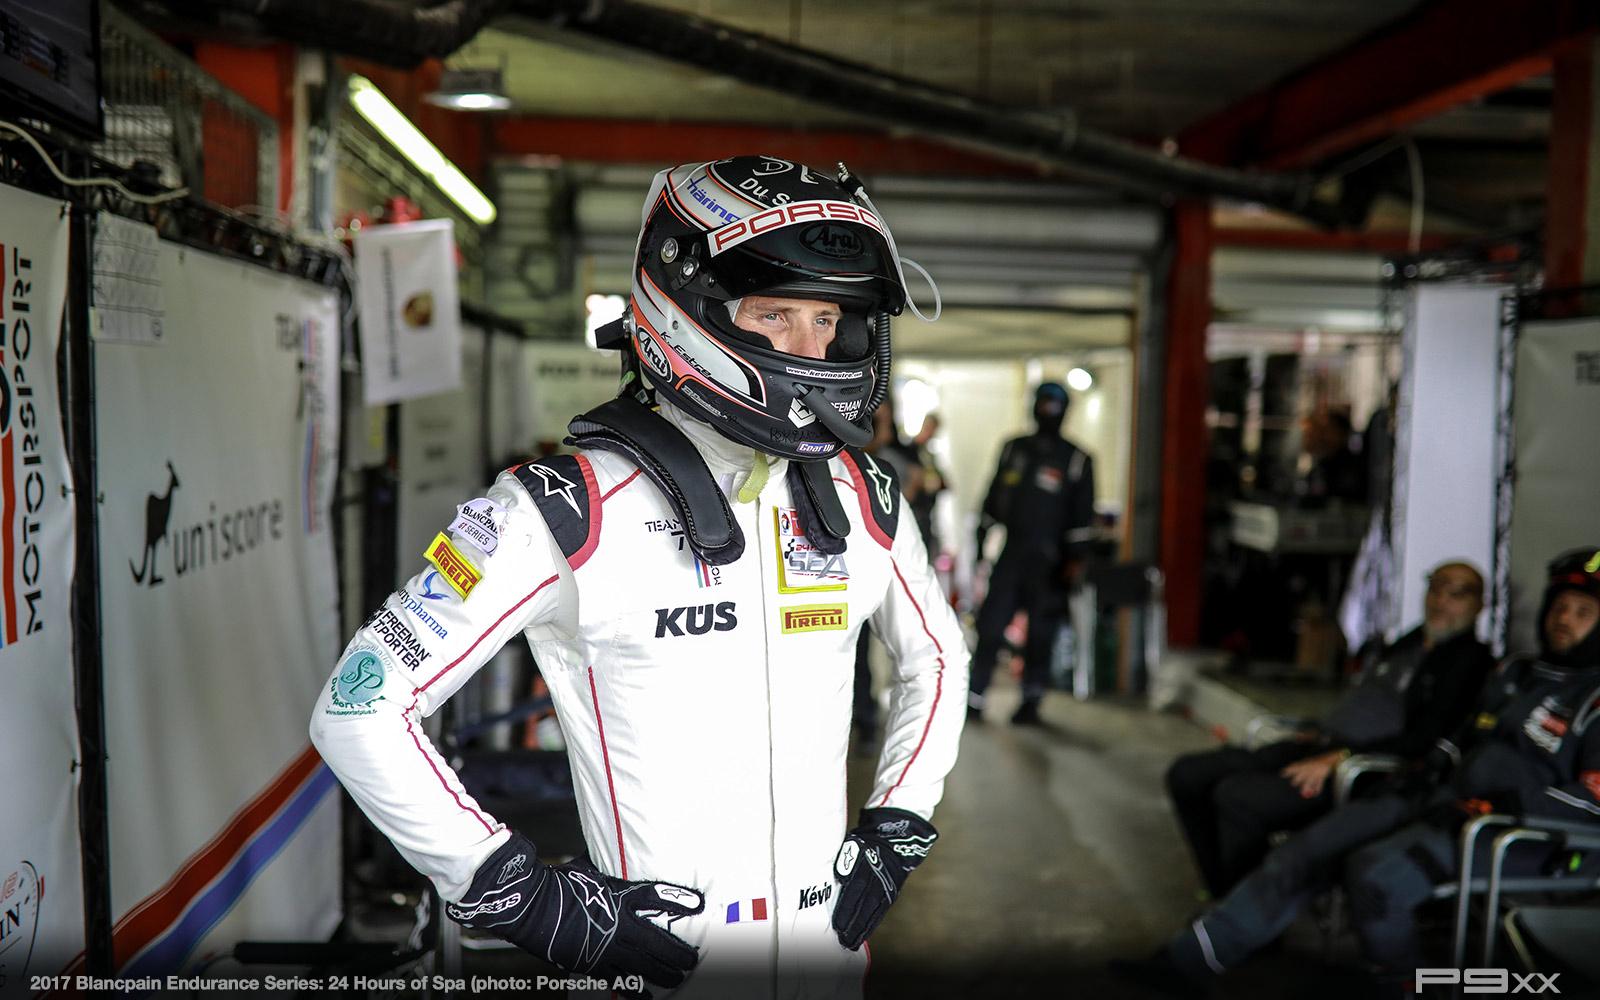 2017-24-Hours-of-Spa-Porsche-378